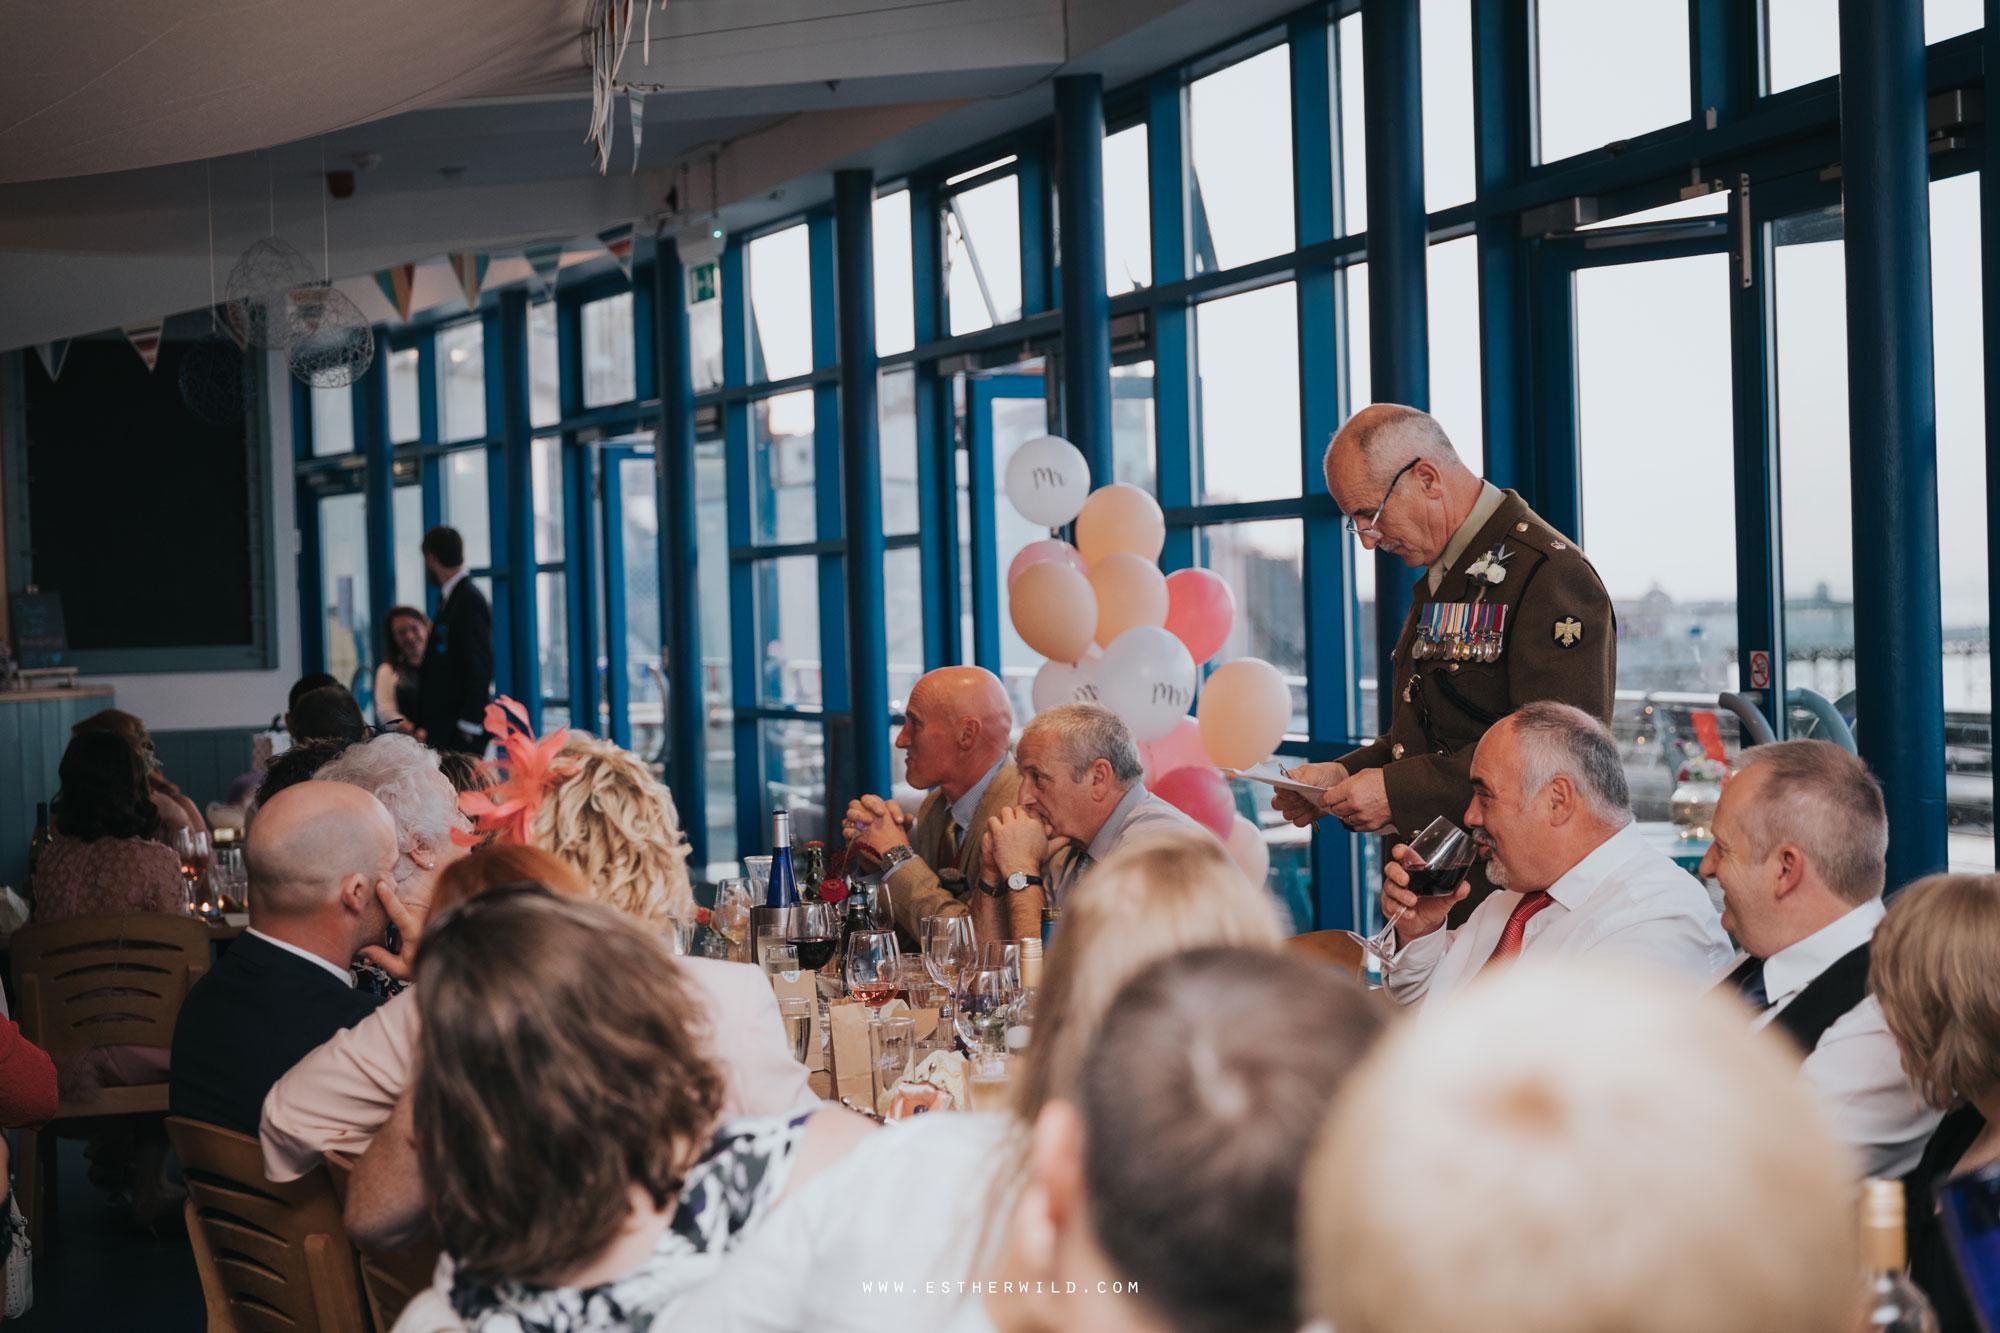 Cromer_Wedding_Beach_Outdoor_Ceremony_Norfolk_North_Lodge_Registry_Office_Rocket_House_Cafe_Cromer_Pier_IMG_5187.jpg